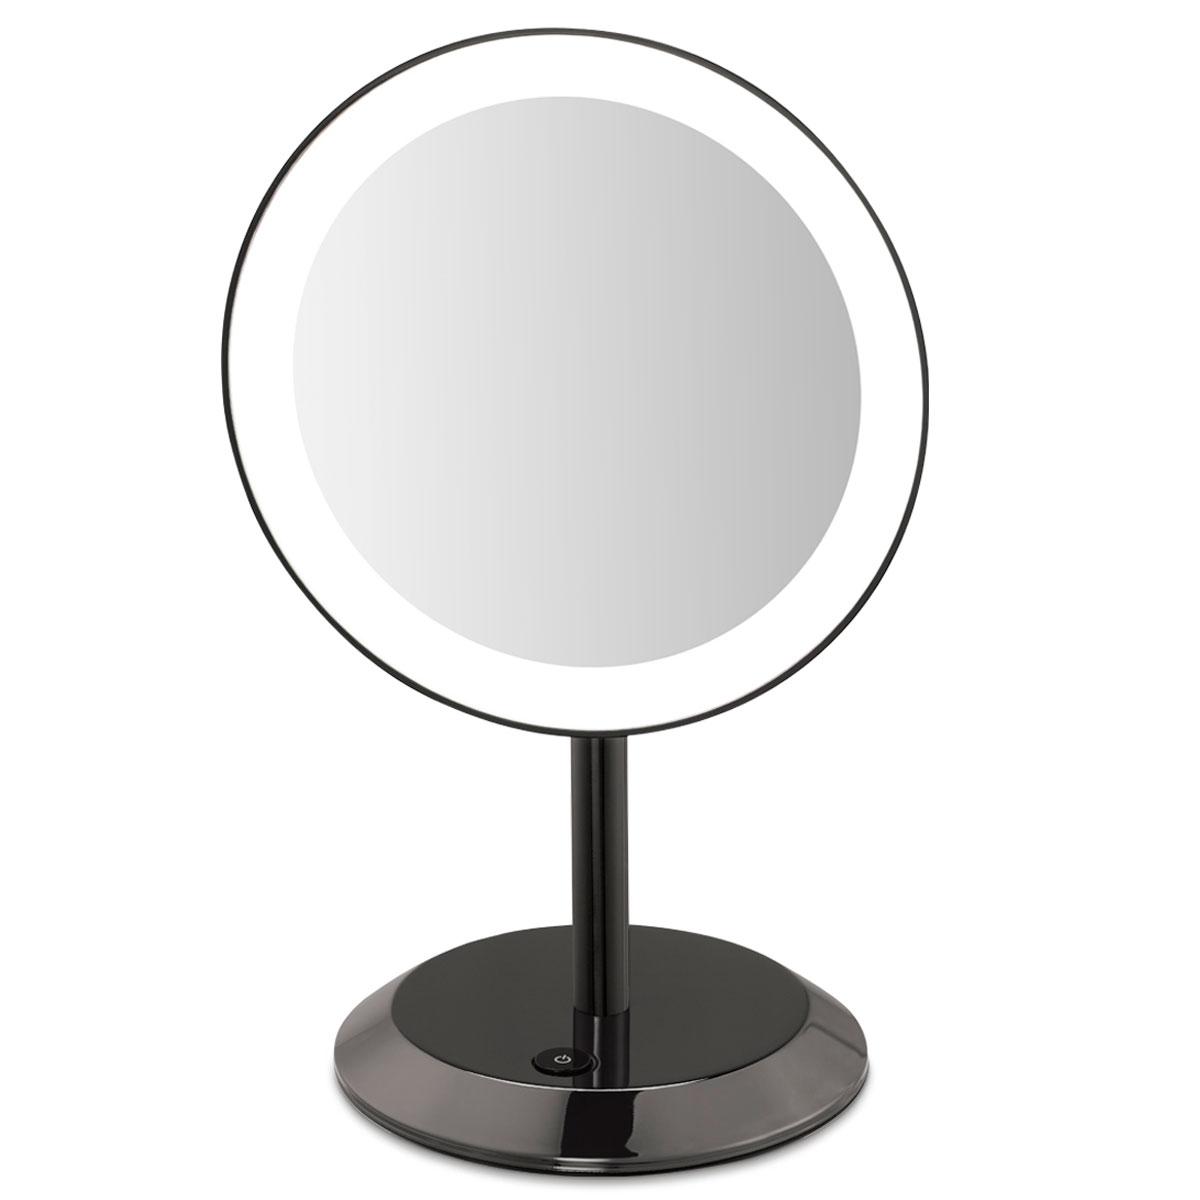 4 led lights mirror circle home u003e conair hospitality mirrors conair be50lbchw 9